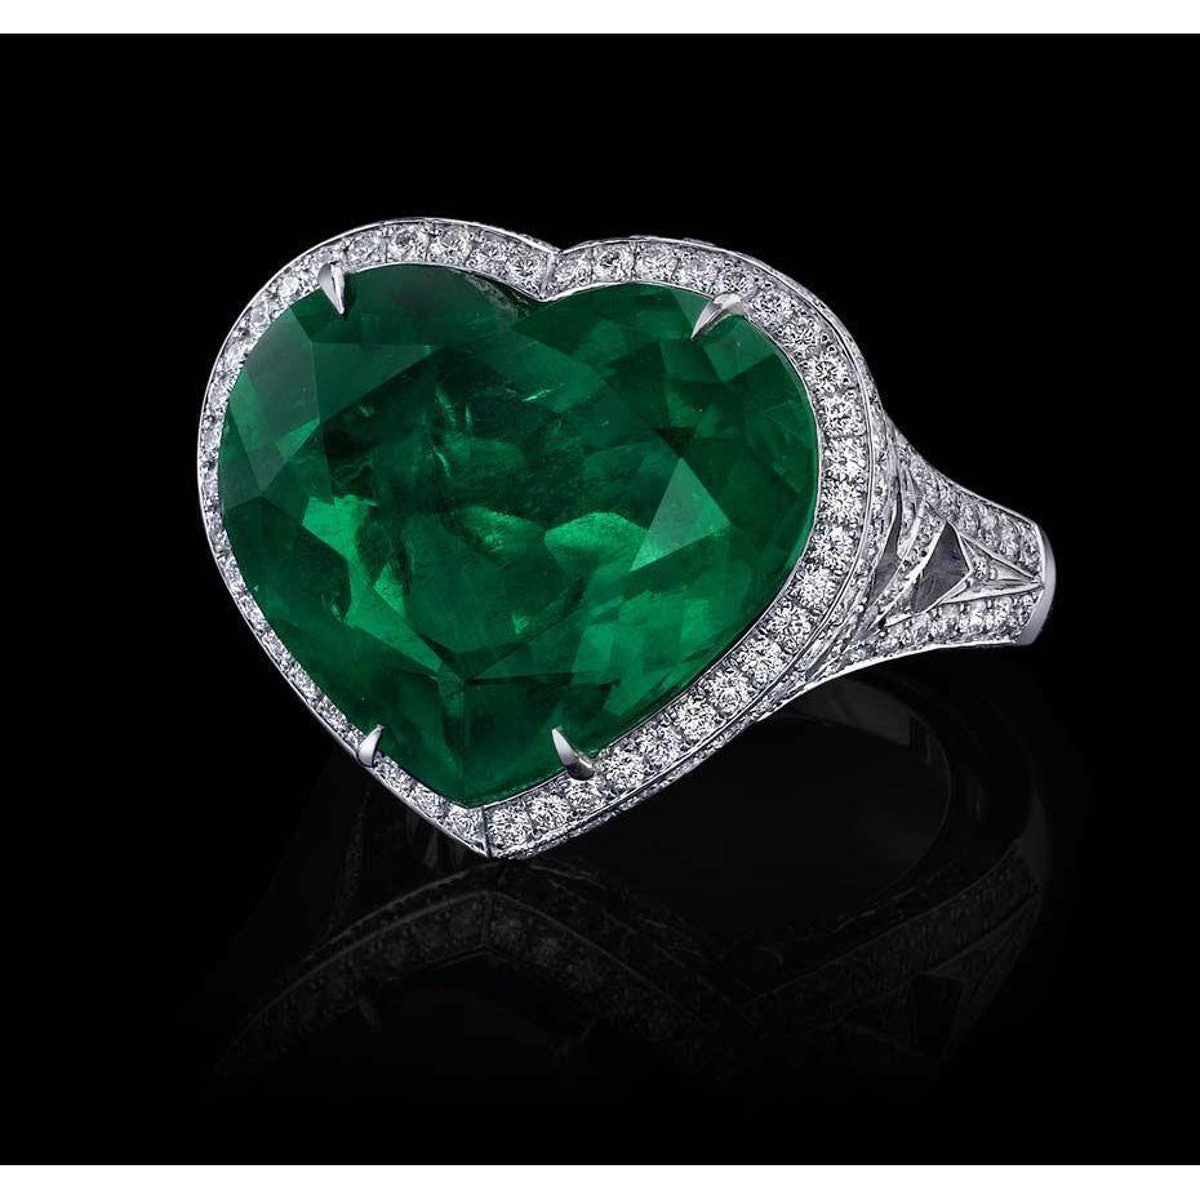 9 Ct Green Heart Cut Emerald And Diamond Wedding Ring White Gold 14K